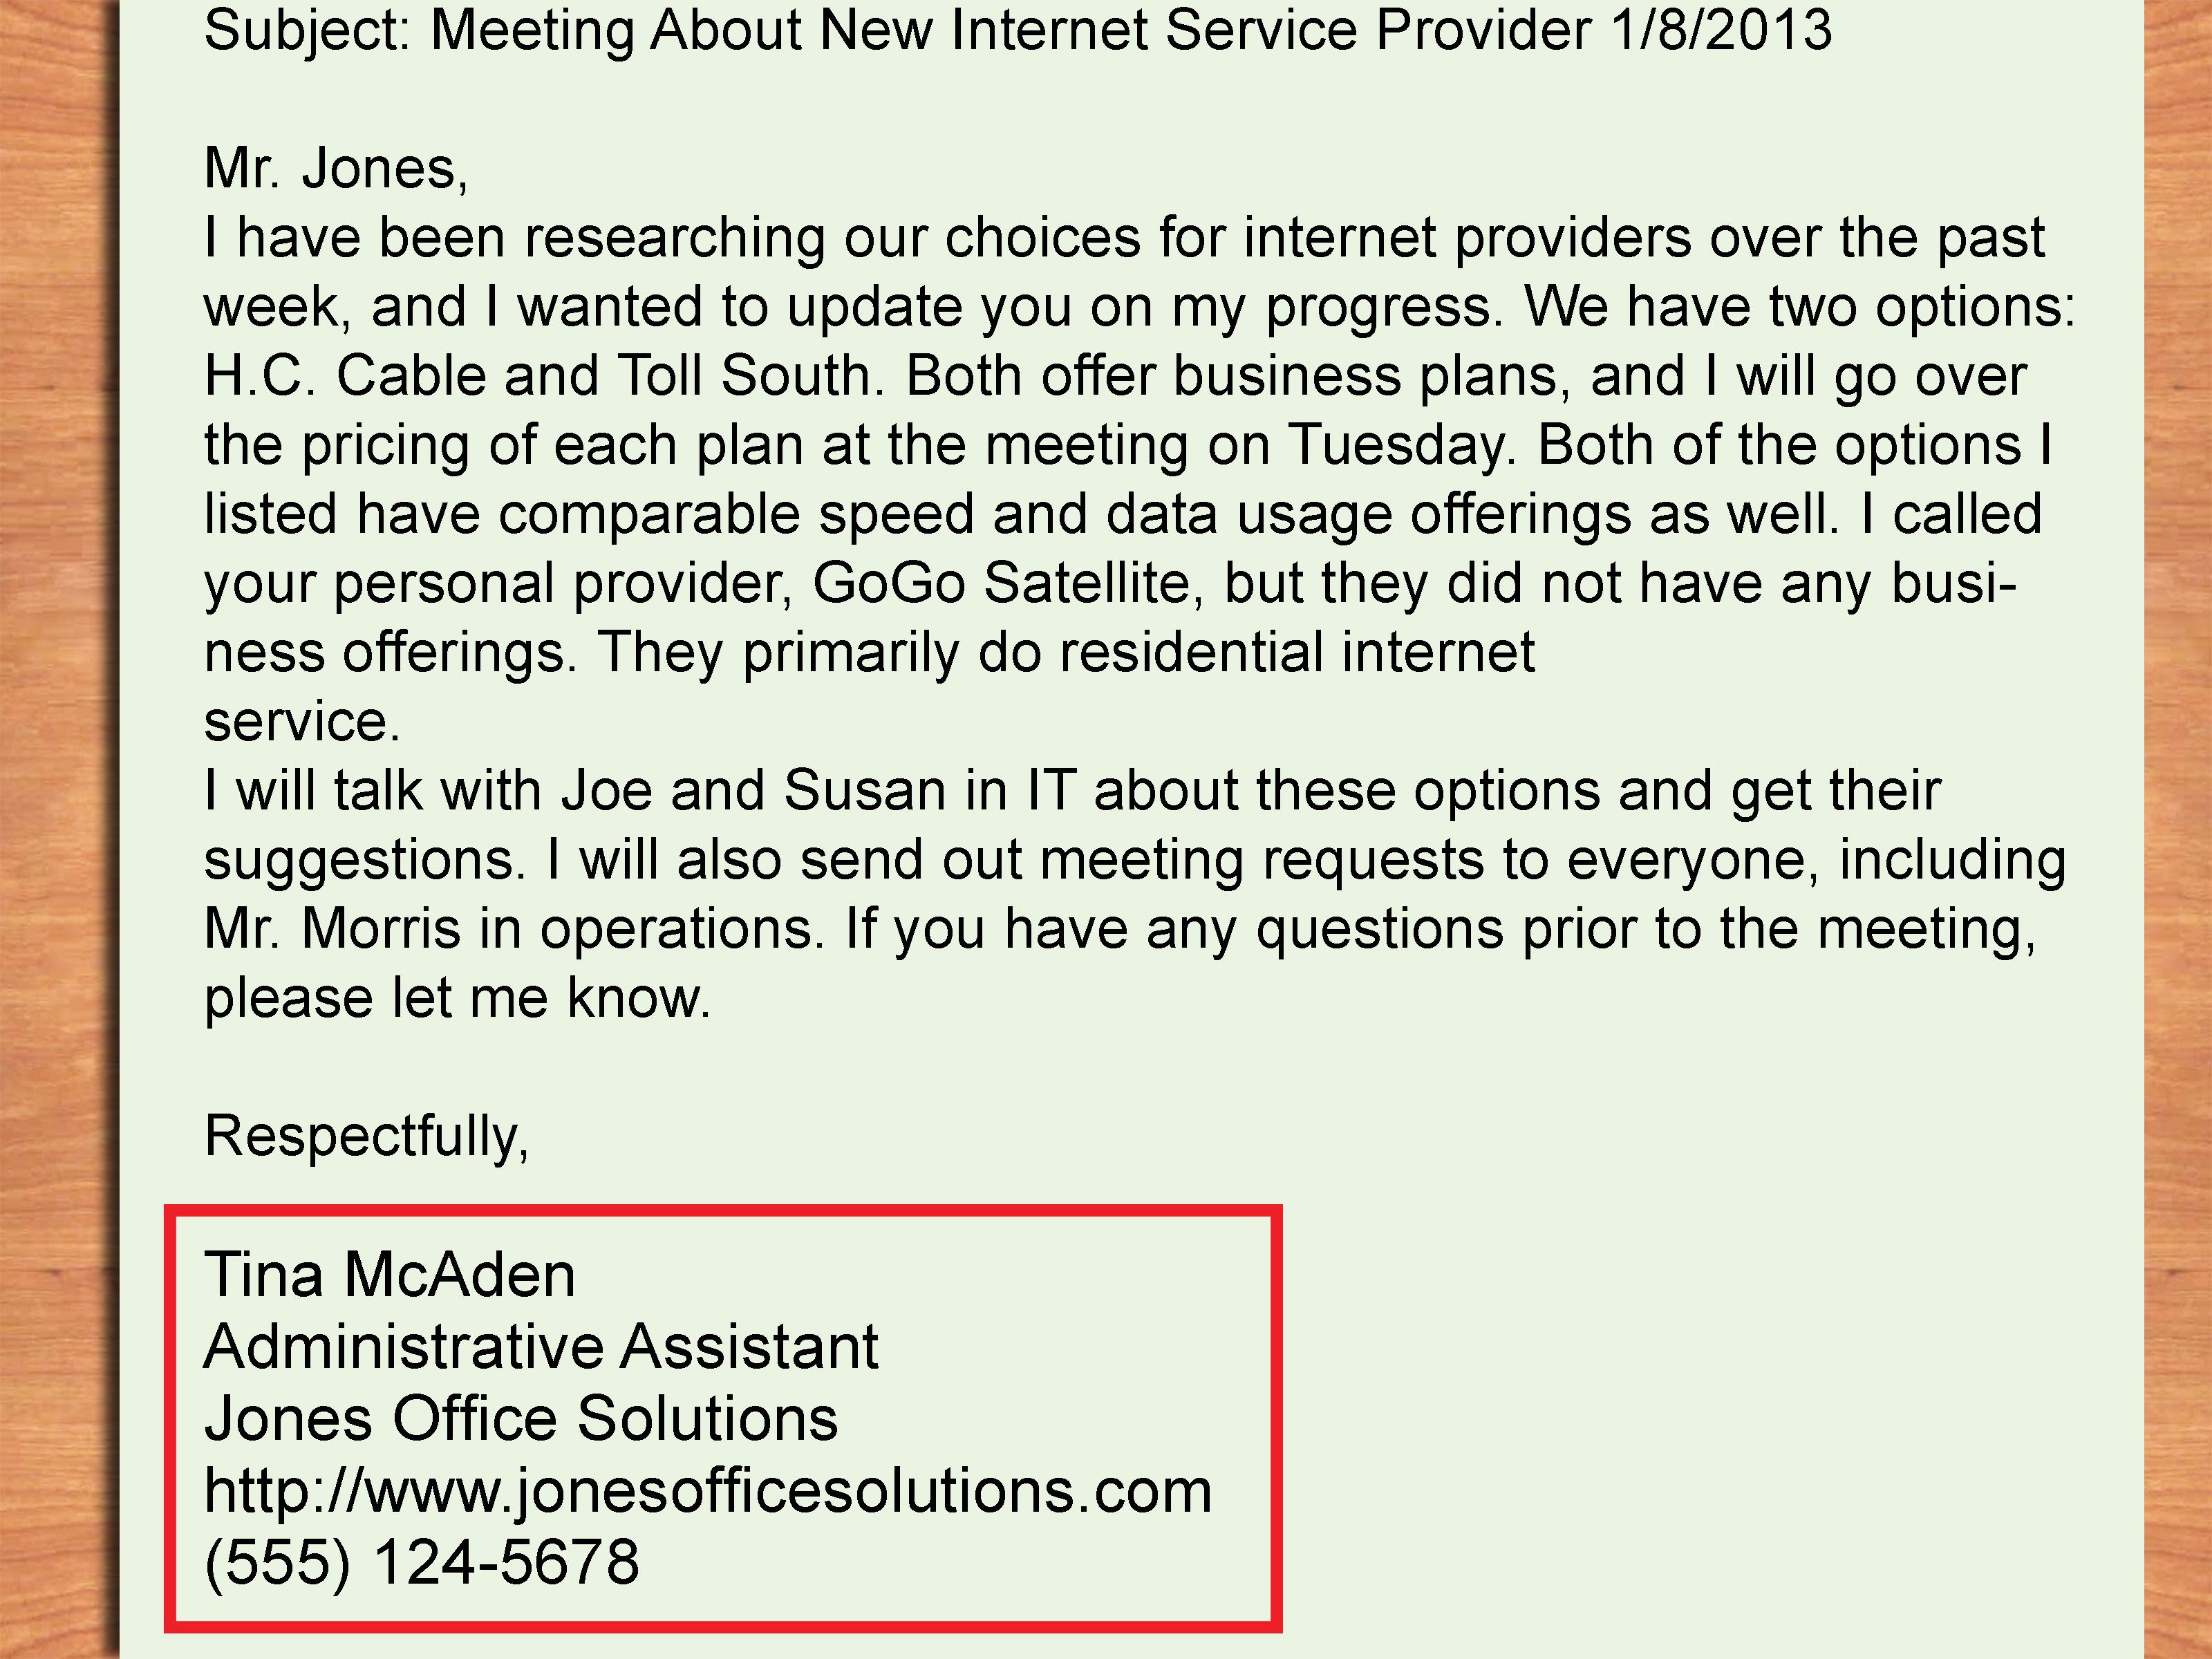 Sample Covering Letter For Sending Resume Through Email. via email ...